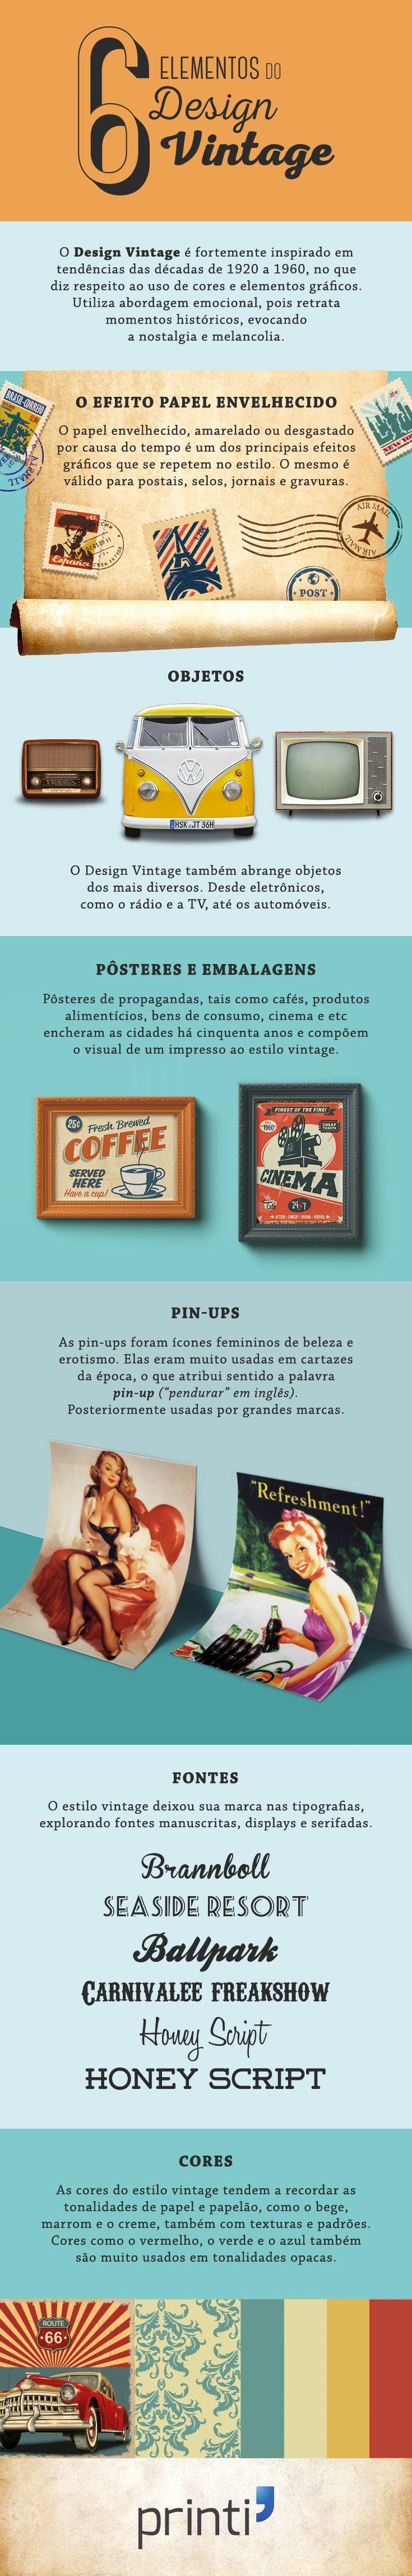 22 best infogrfico images on pinterest business management 6 elementos do design vintage saiba mais sobre um dos estilos visuais mais fandeluxe Choice Image